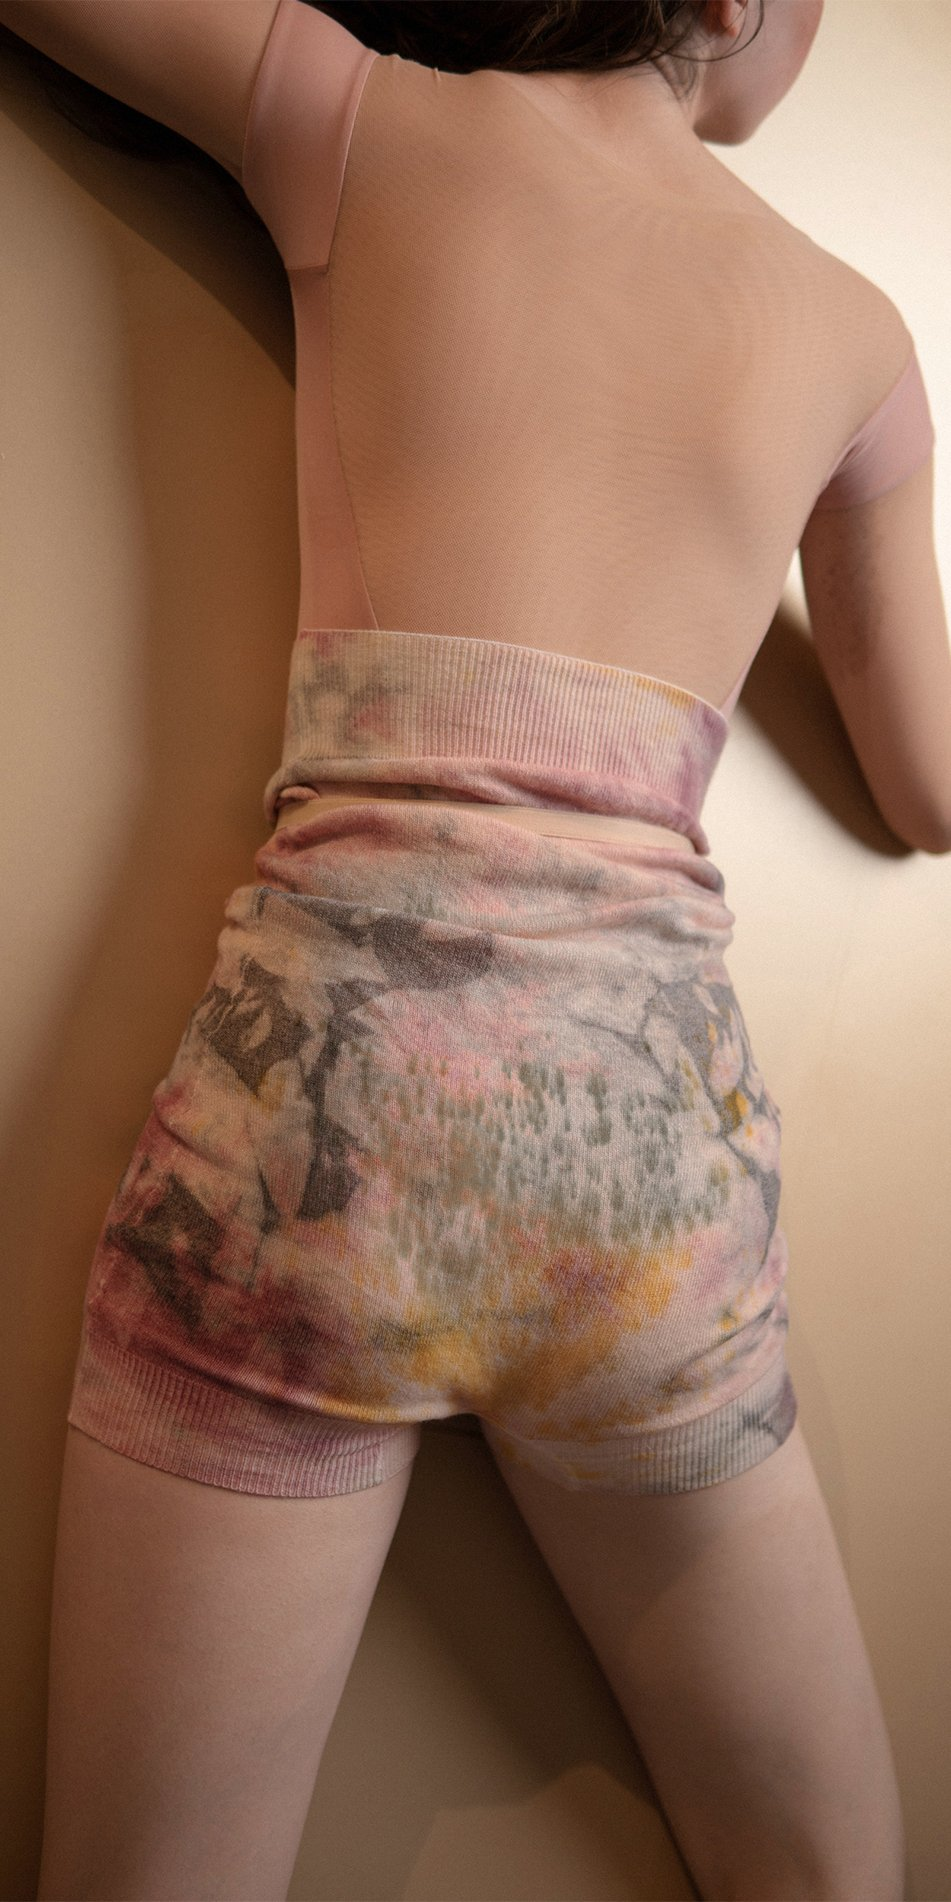 TIETIE DYE KNIWEAR shorts burgundy 5